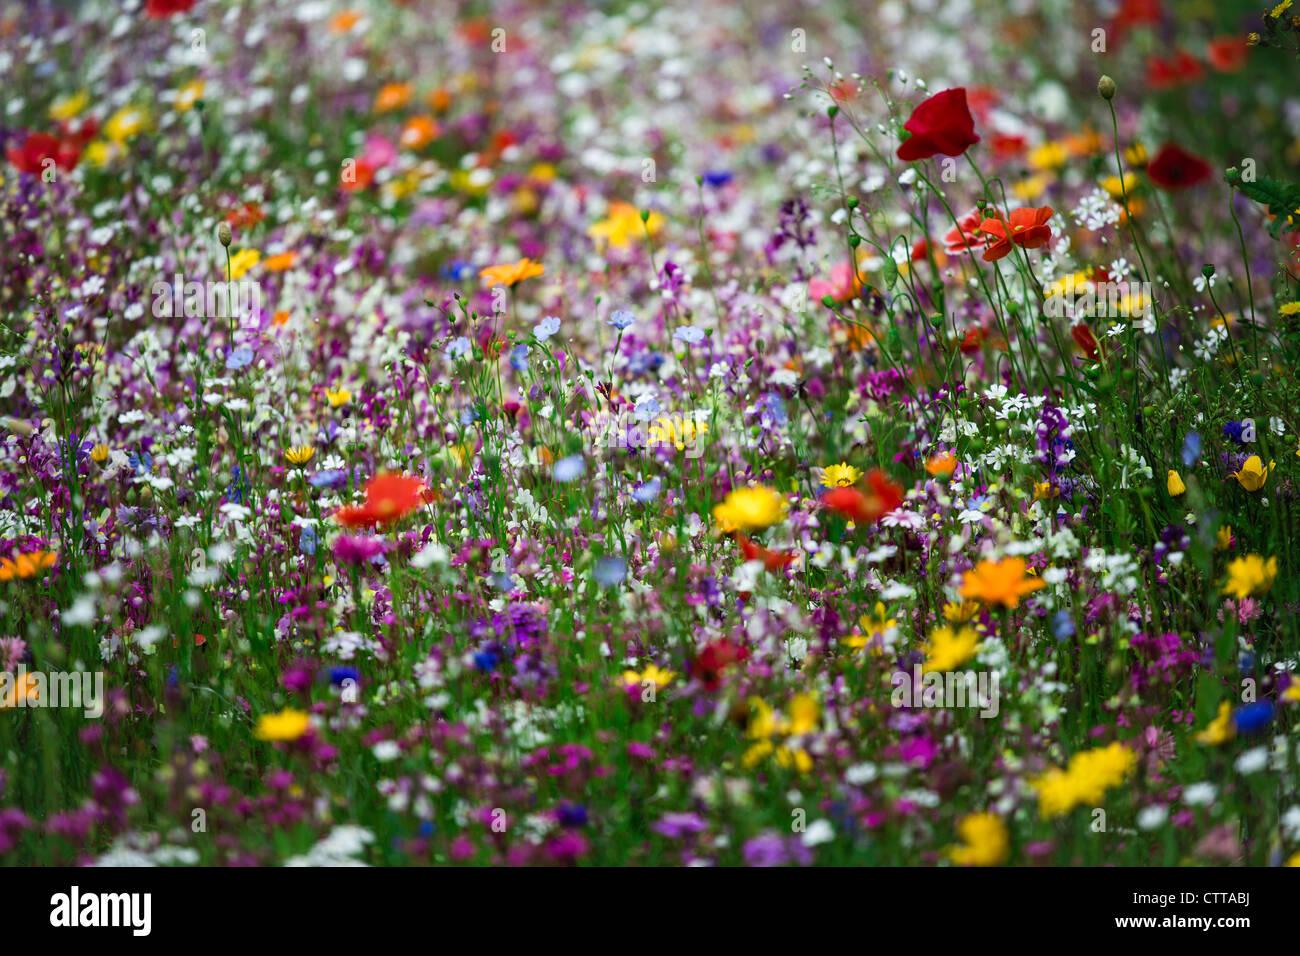 Wild flowers growing in Birmingham, UK - Stock Image